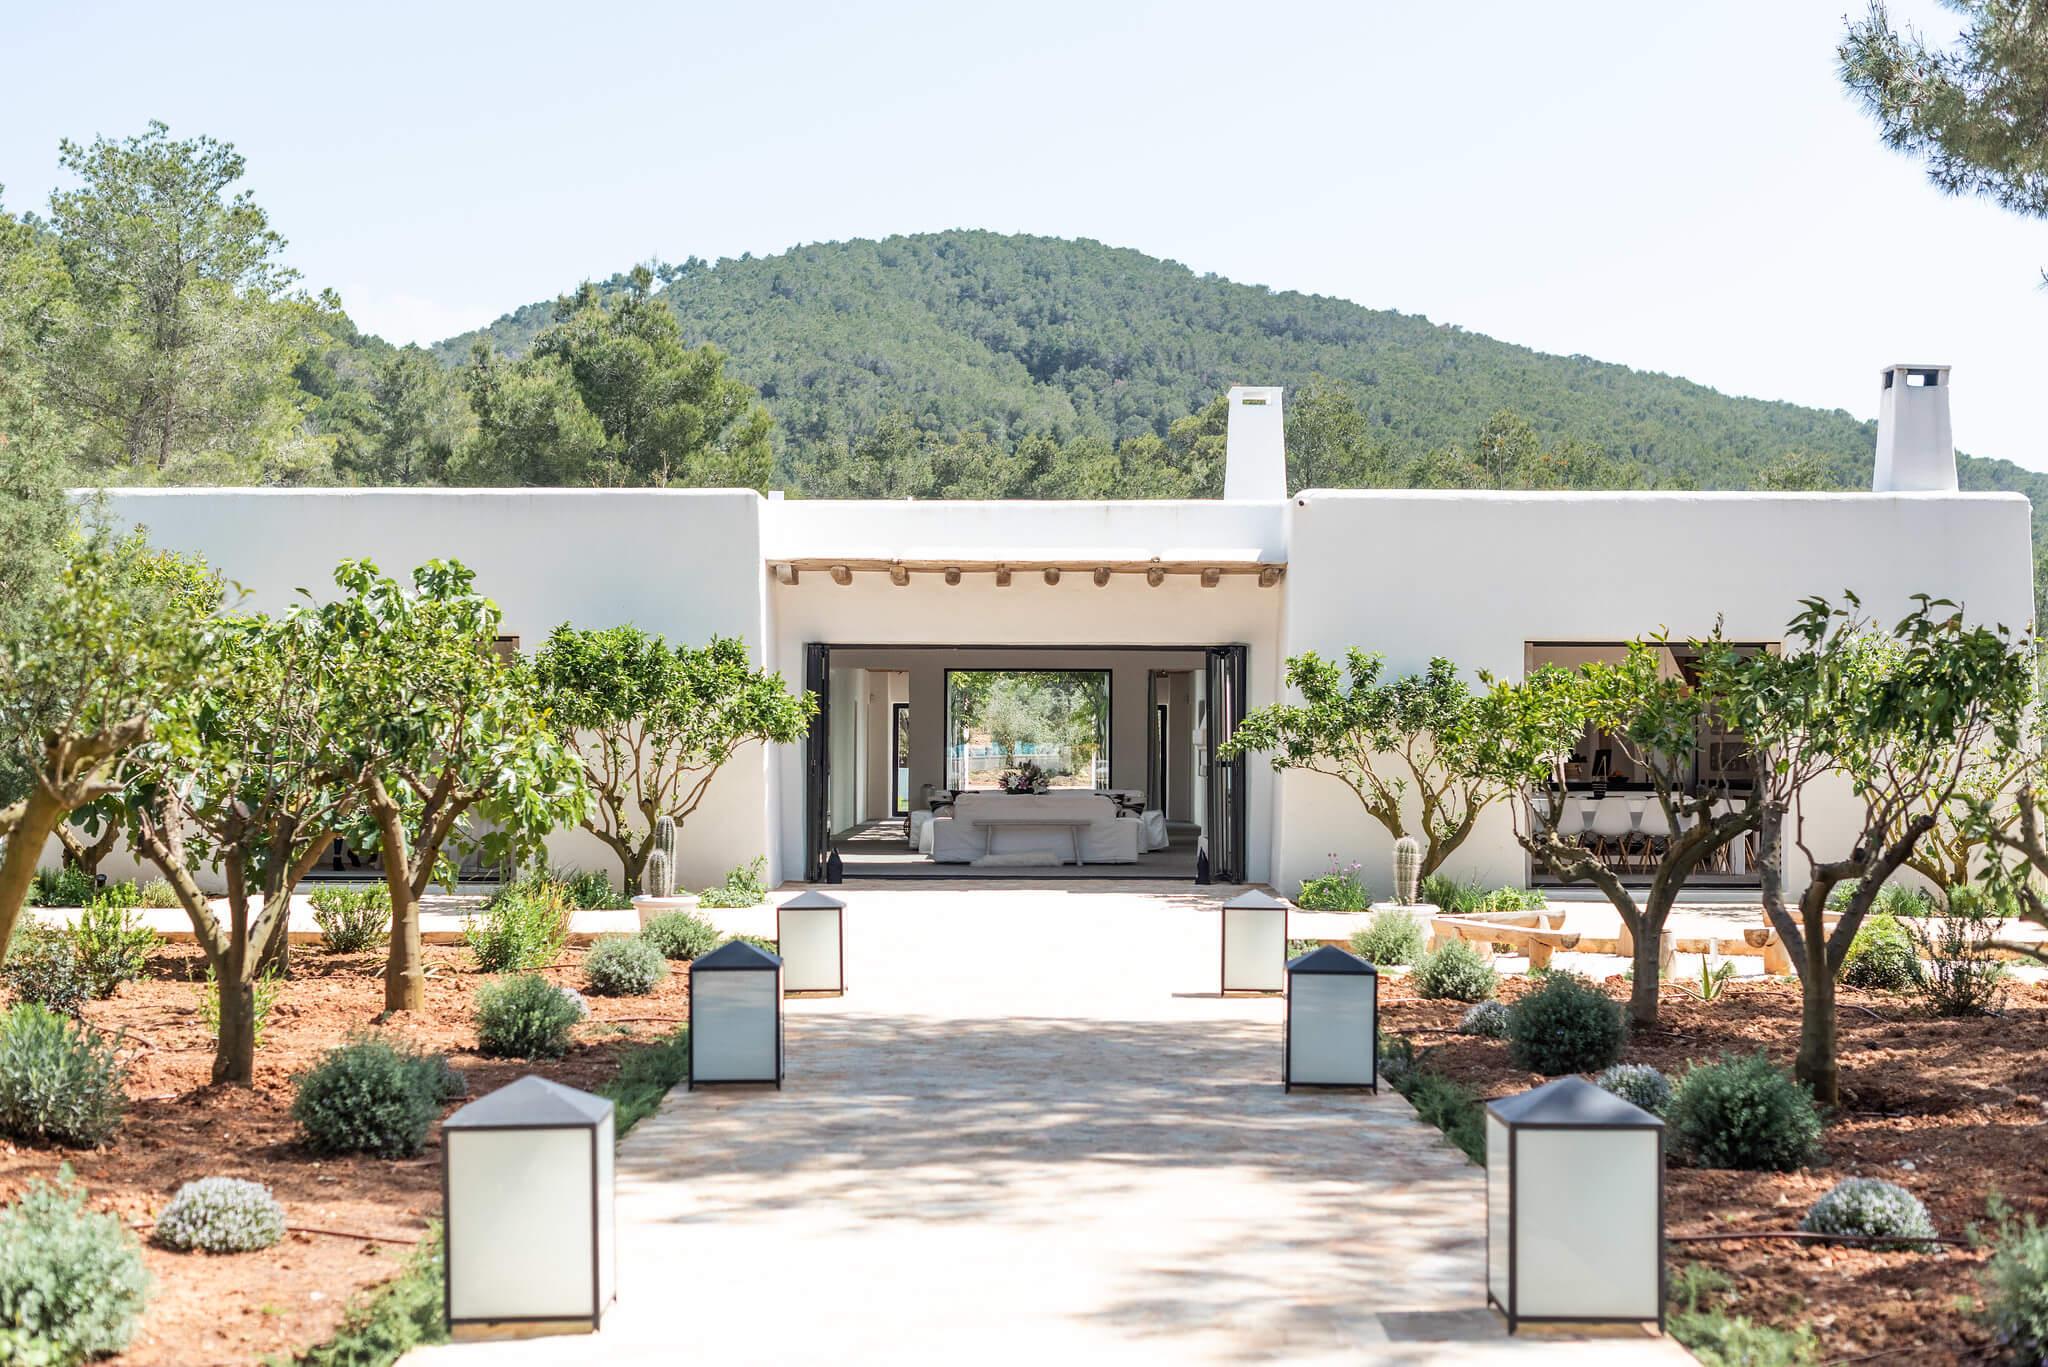 https://www.white-ibiza.com/wp-content/uploads/2020/05/white-ibiza-villas-can-terra-exterior2.jpg